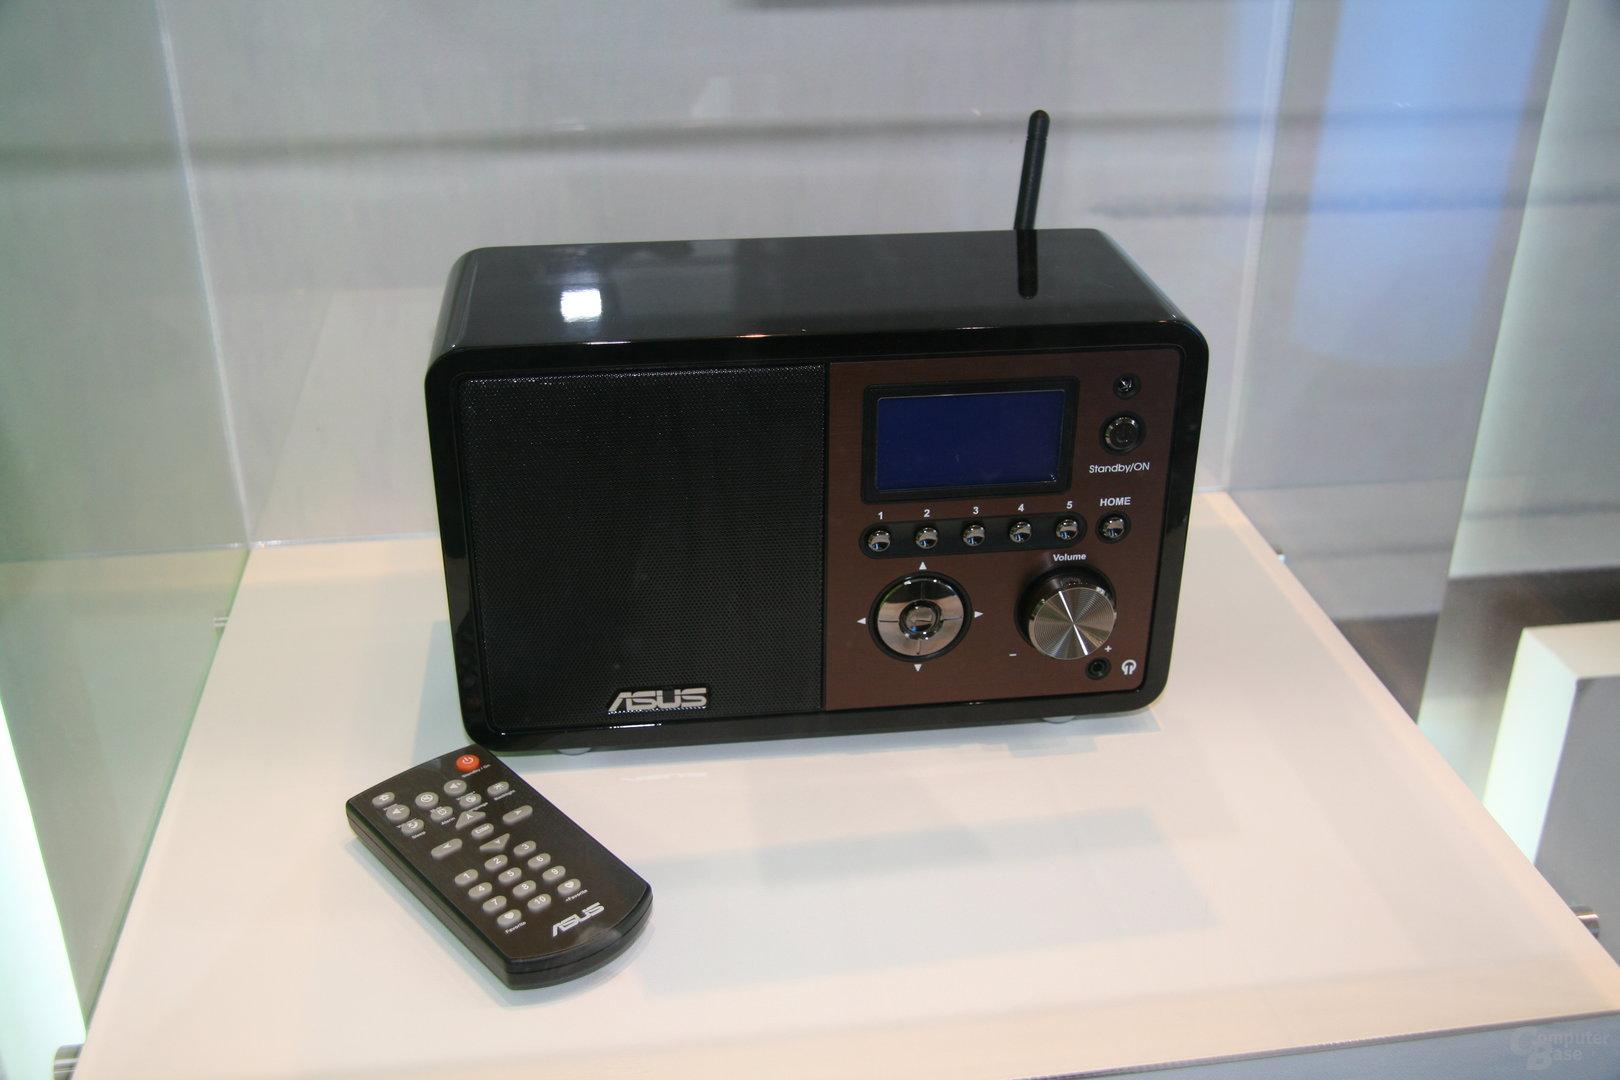 Asus Internet Radio AIR